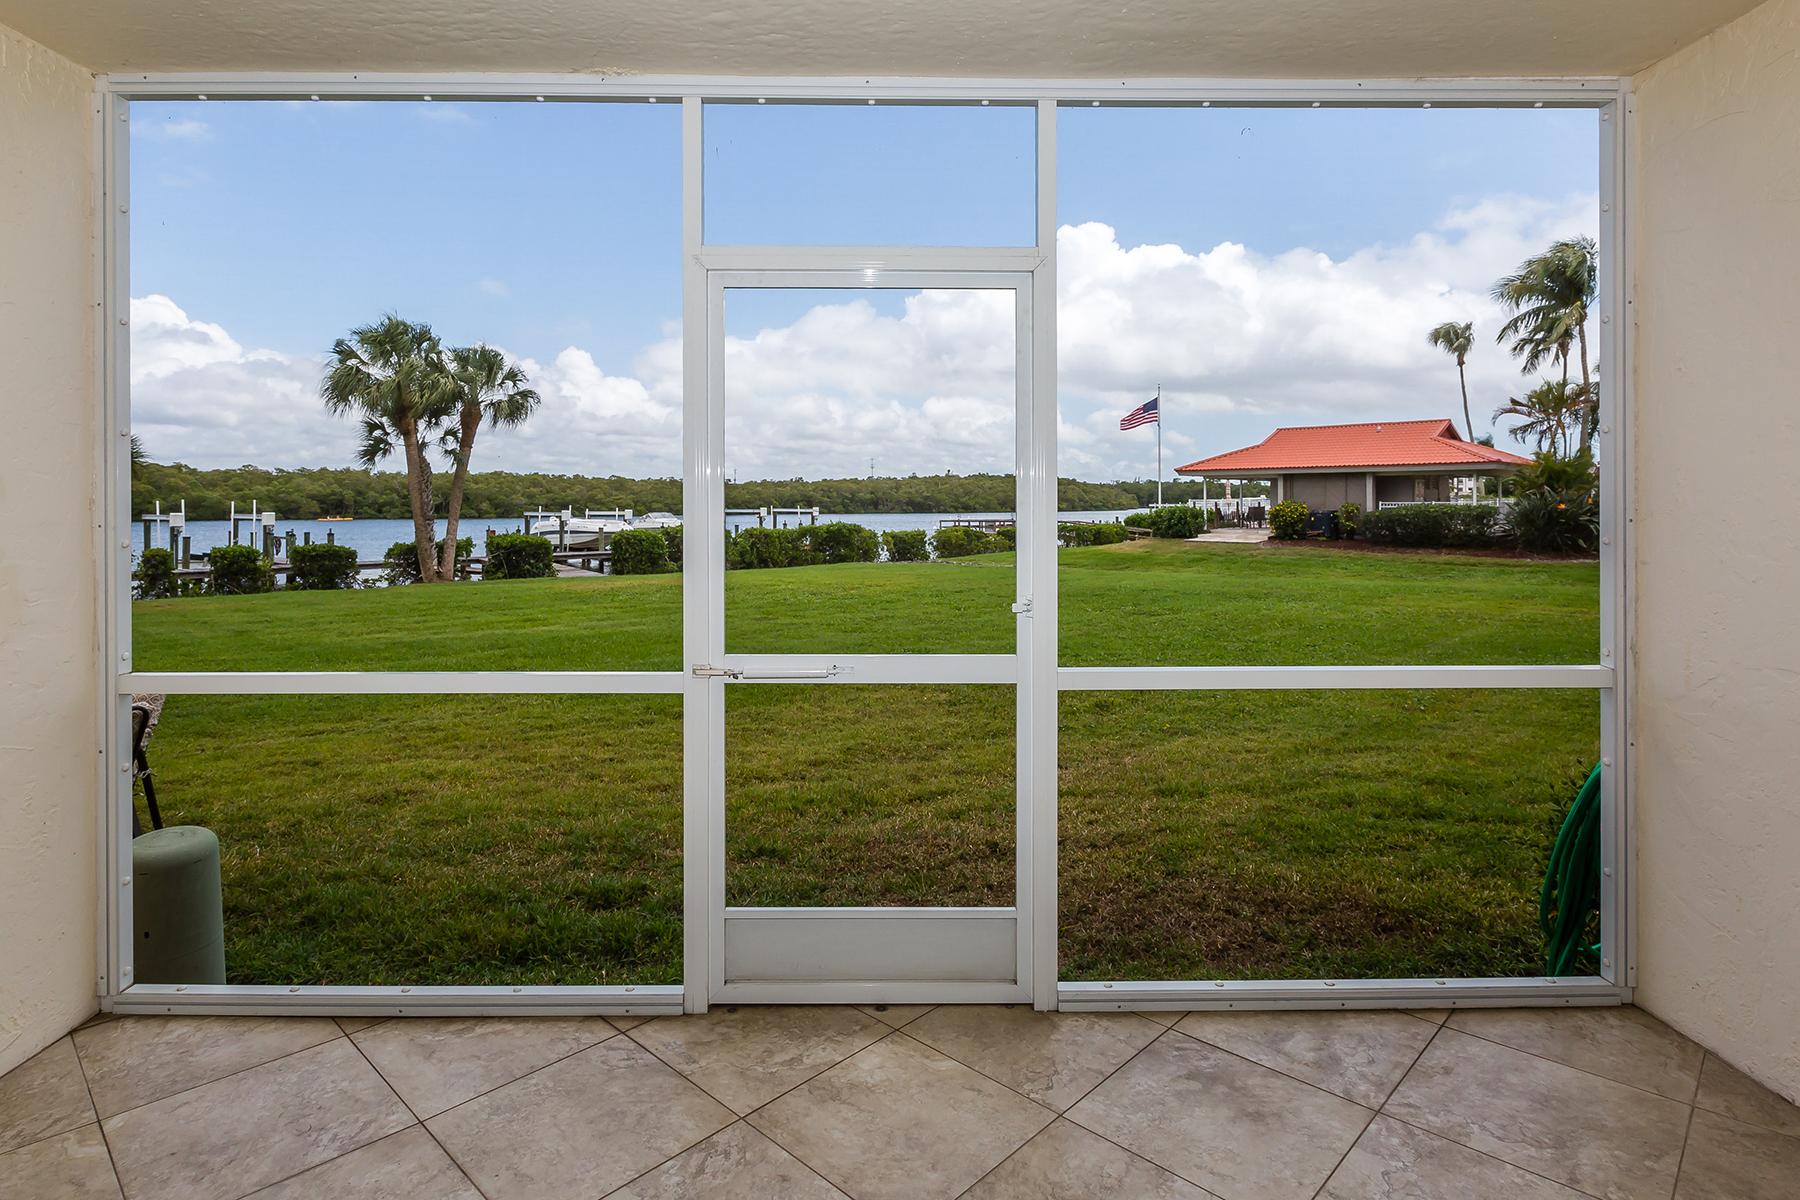 Condominium for Sale at 305 Goodlette Rd S, C-204, Naples, FL 34102 305 Goodlette Rd S C-204 Naples, Florida, 34102 United States